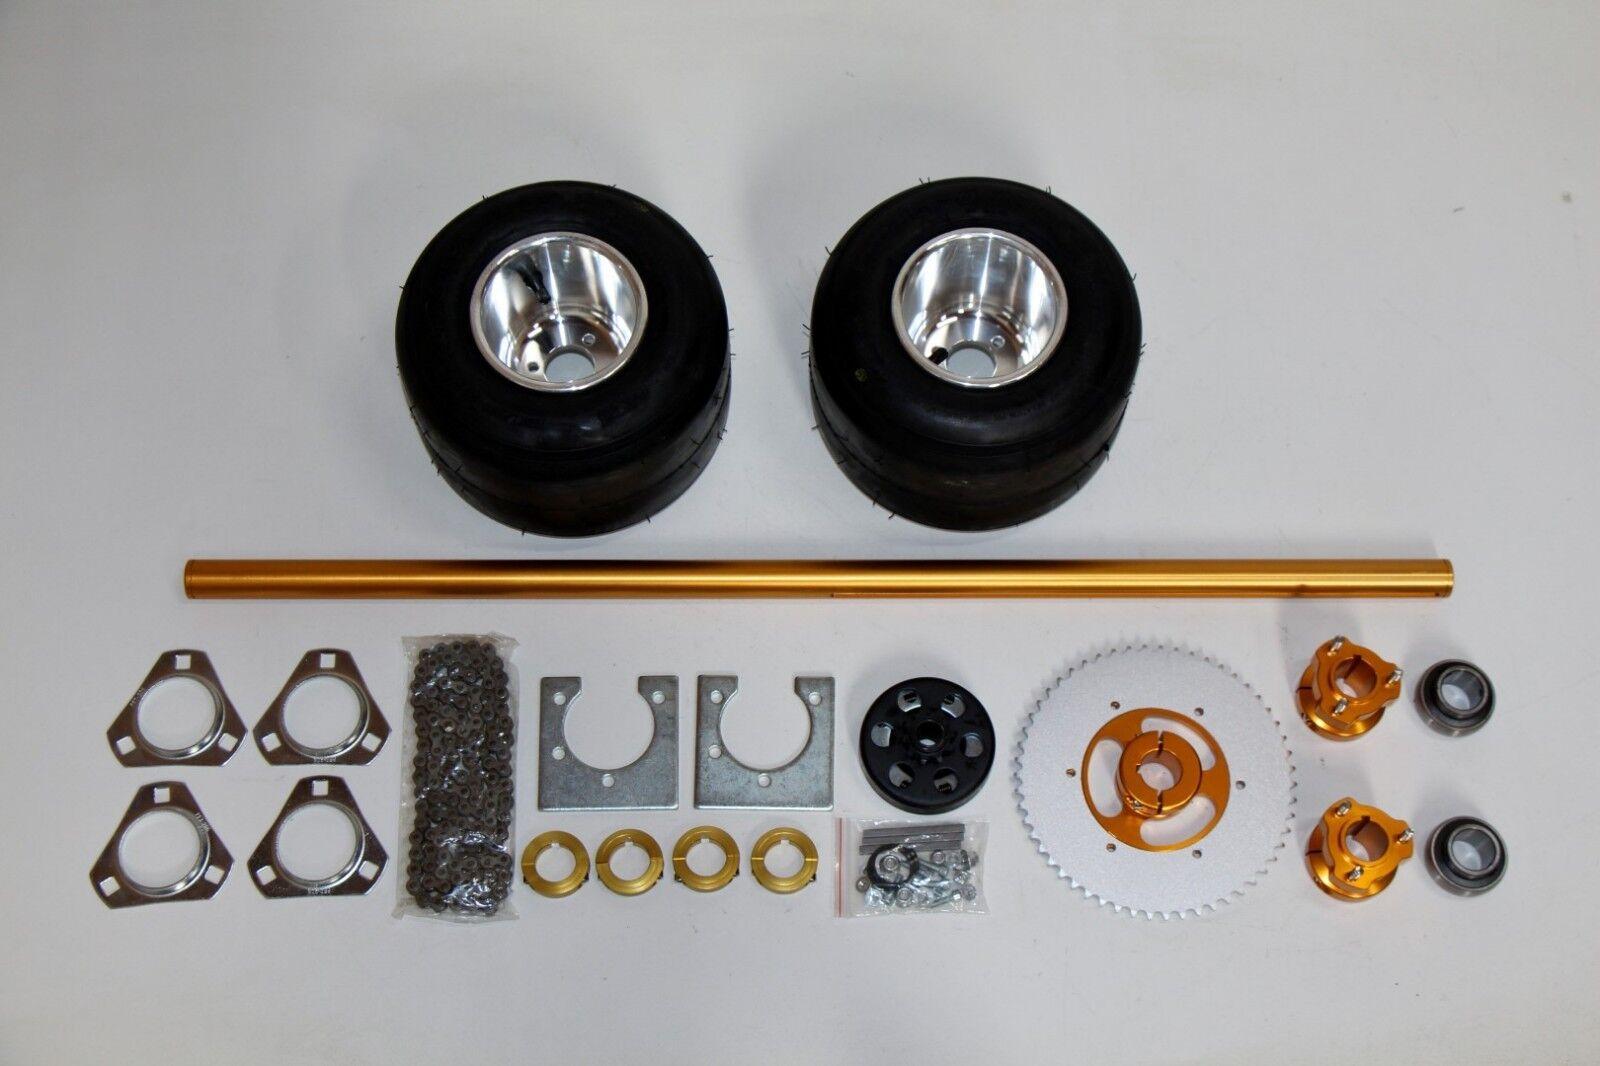 Drift Trike bike kit 40  aluminum axle, mounted tires, bearings, chain, hubs